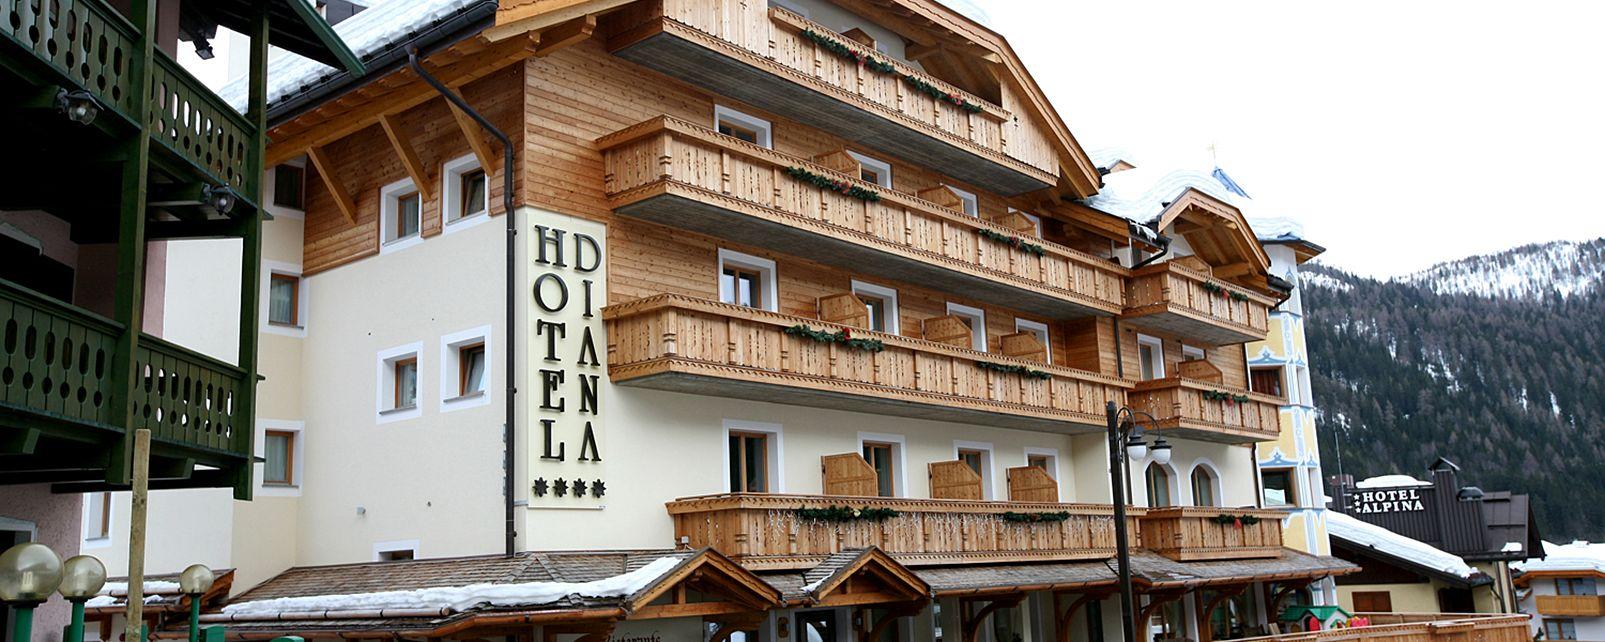 Hôtel Diana